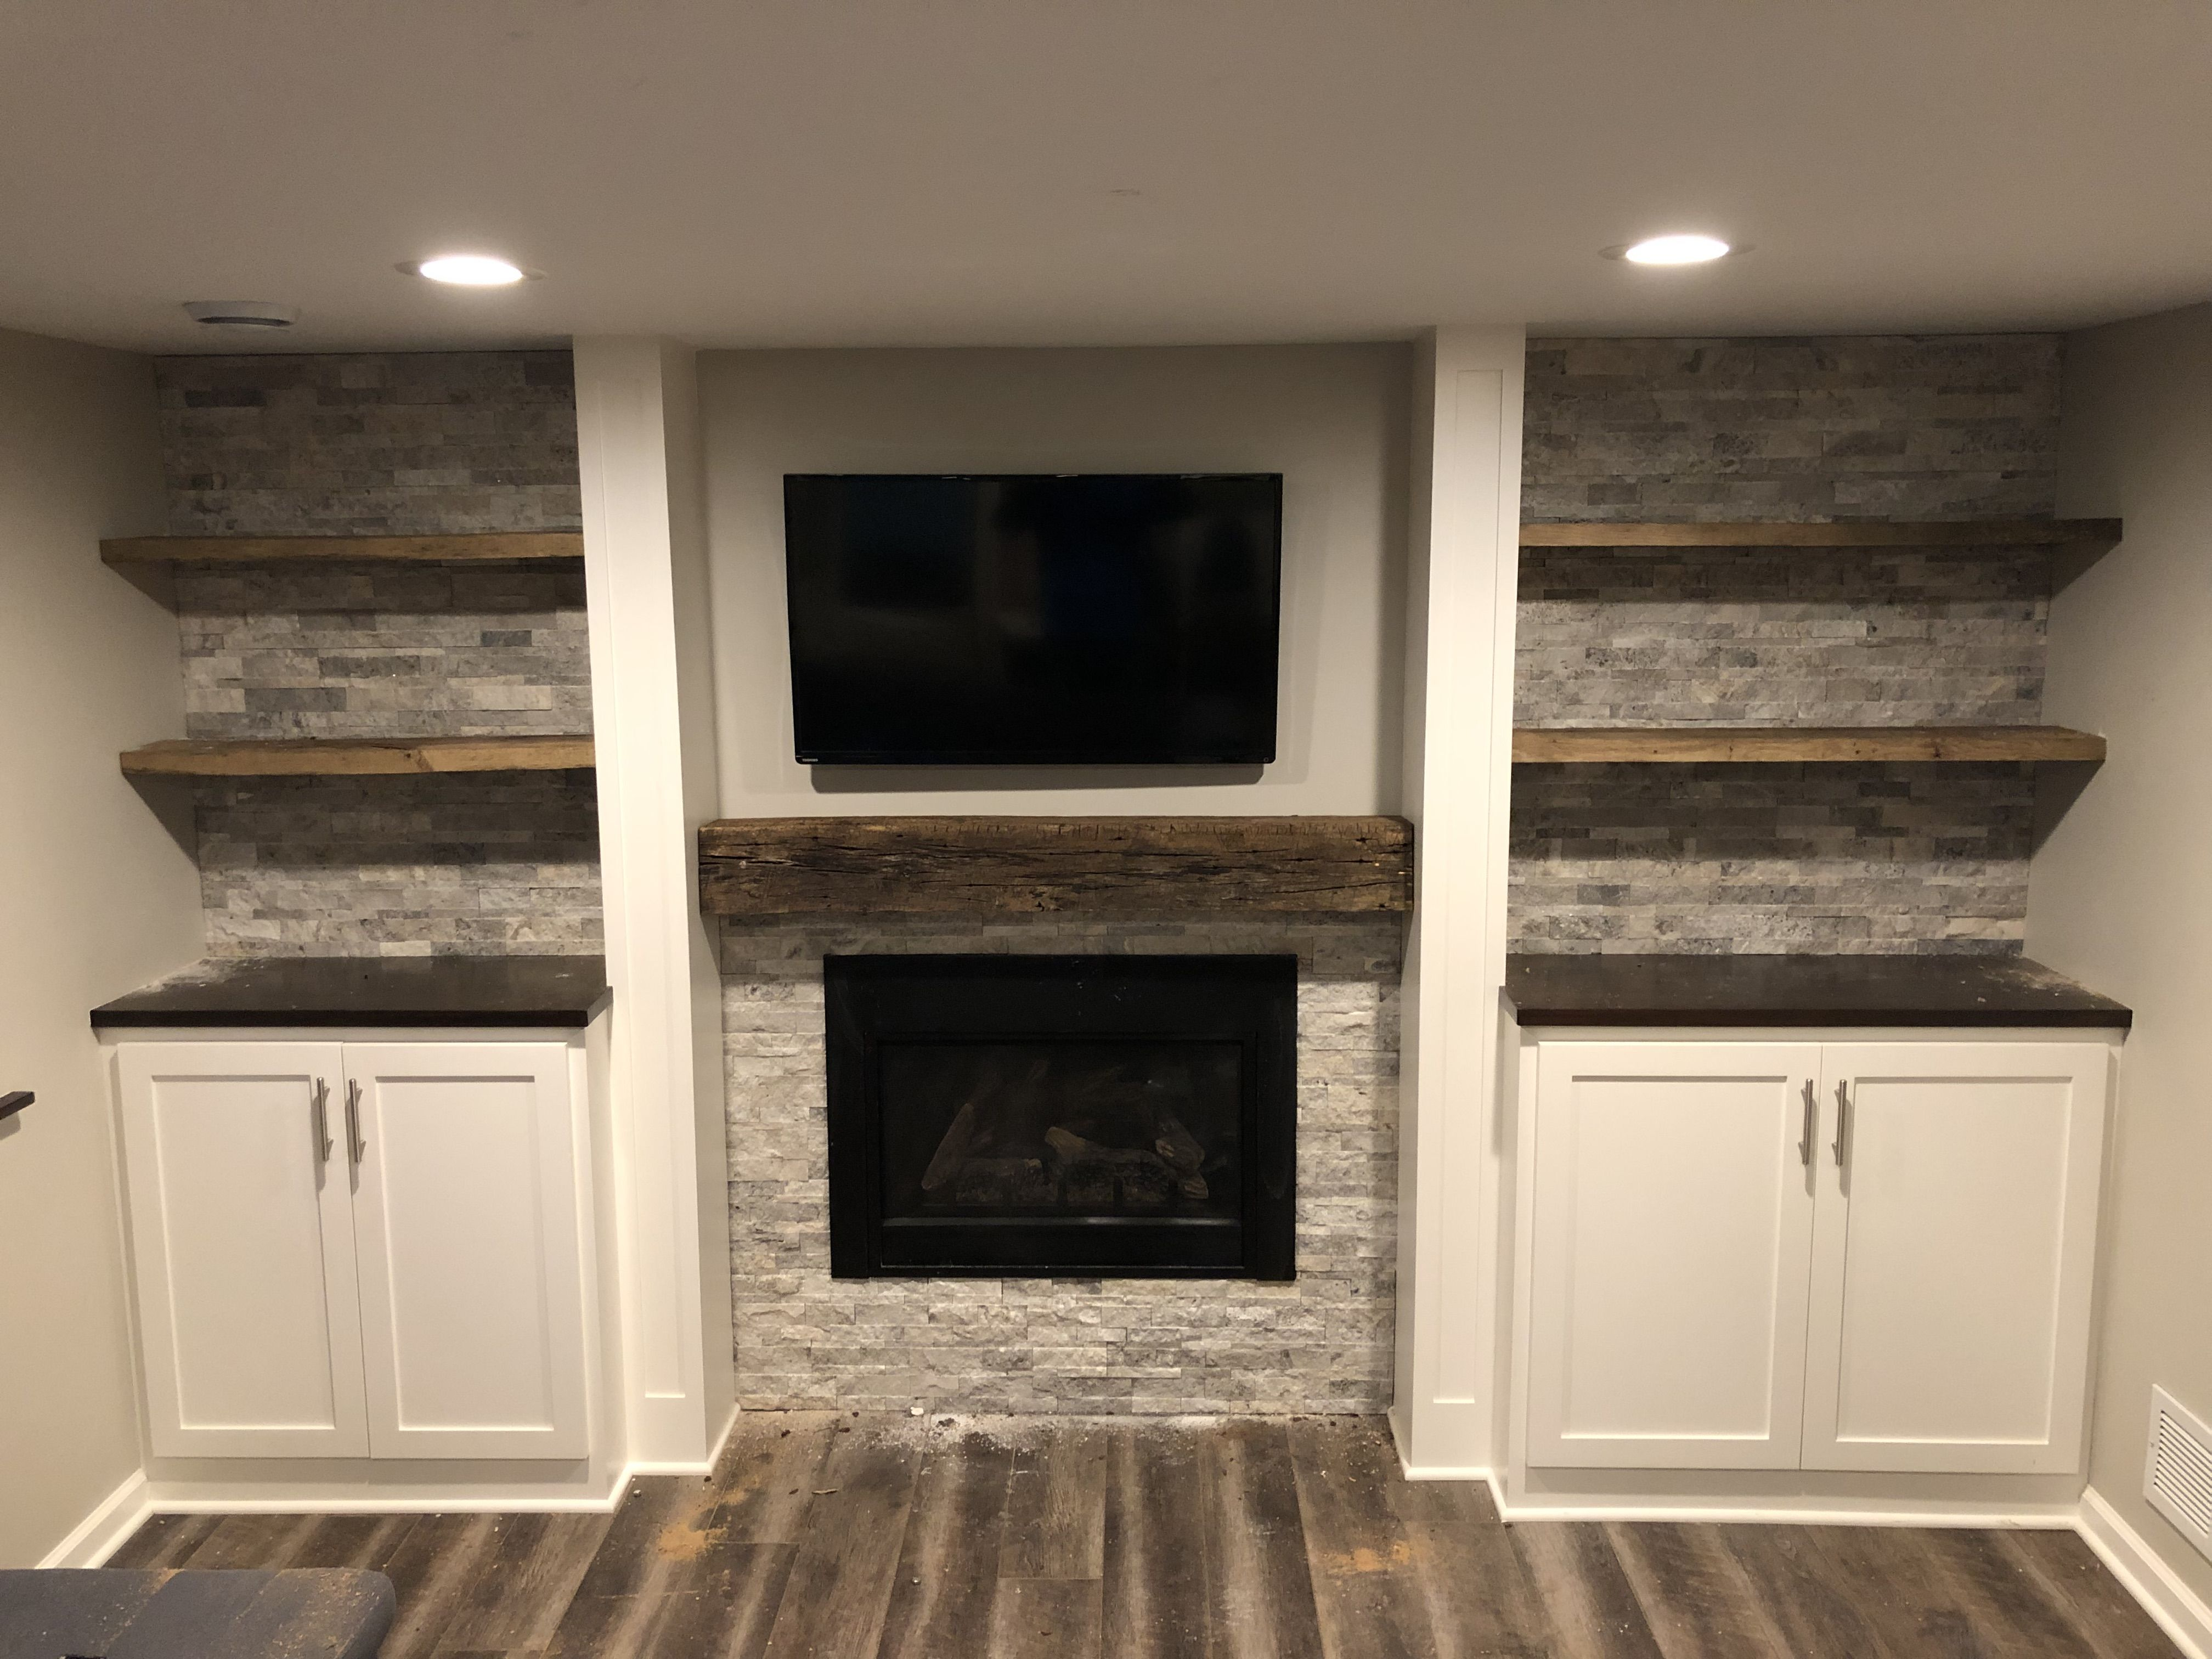 Basement Fireplace Built In Minnetonka Mn Fireplace Built Ins Fireplace Remodel Basement Guest Rooms